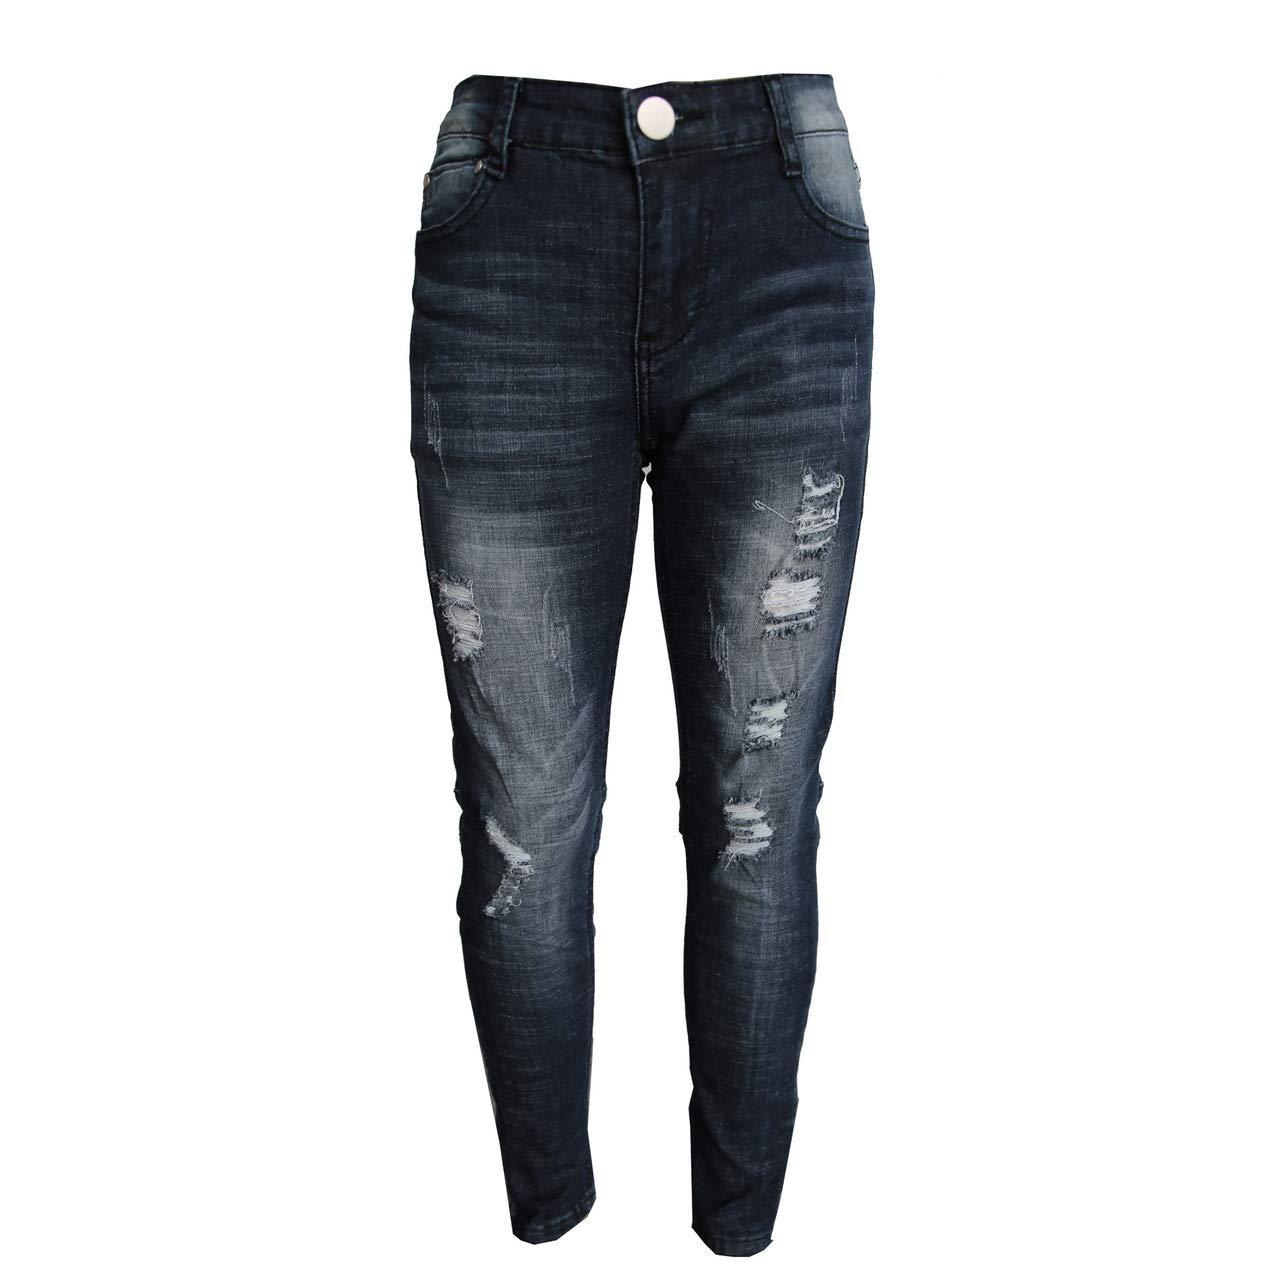 GUBA/® Girls Skinny Jeans Denim Ripped Stretchy Jeggings Designer Pants Fashion Trousers